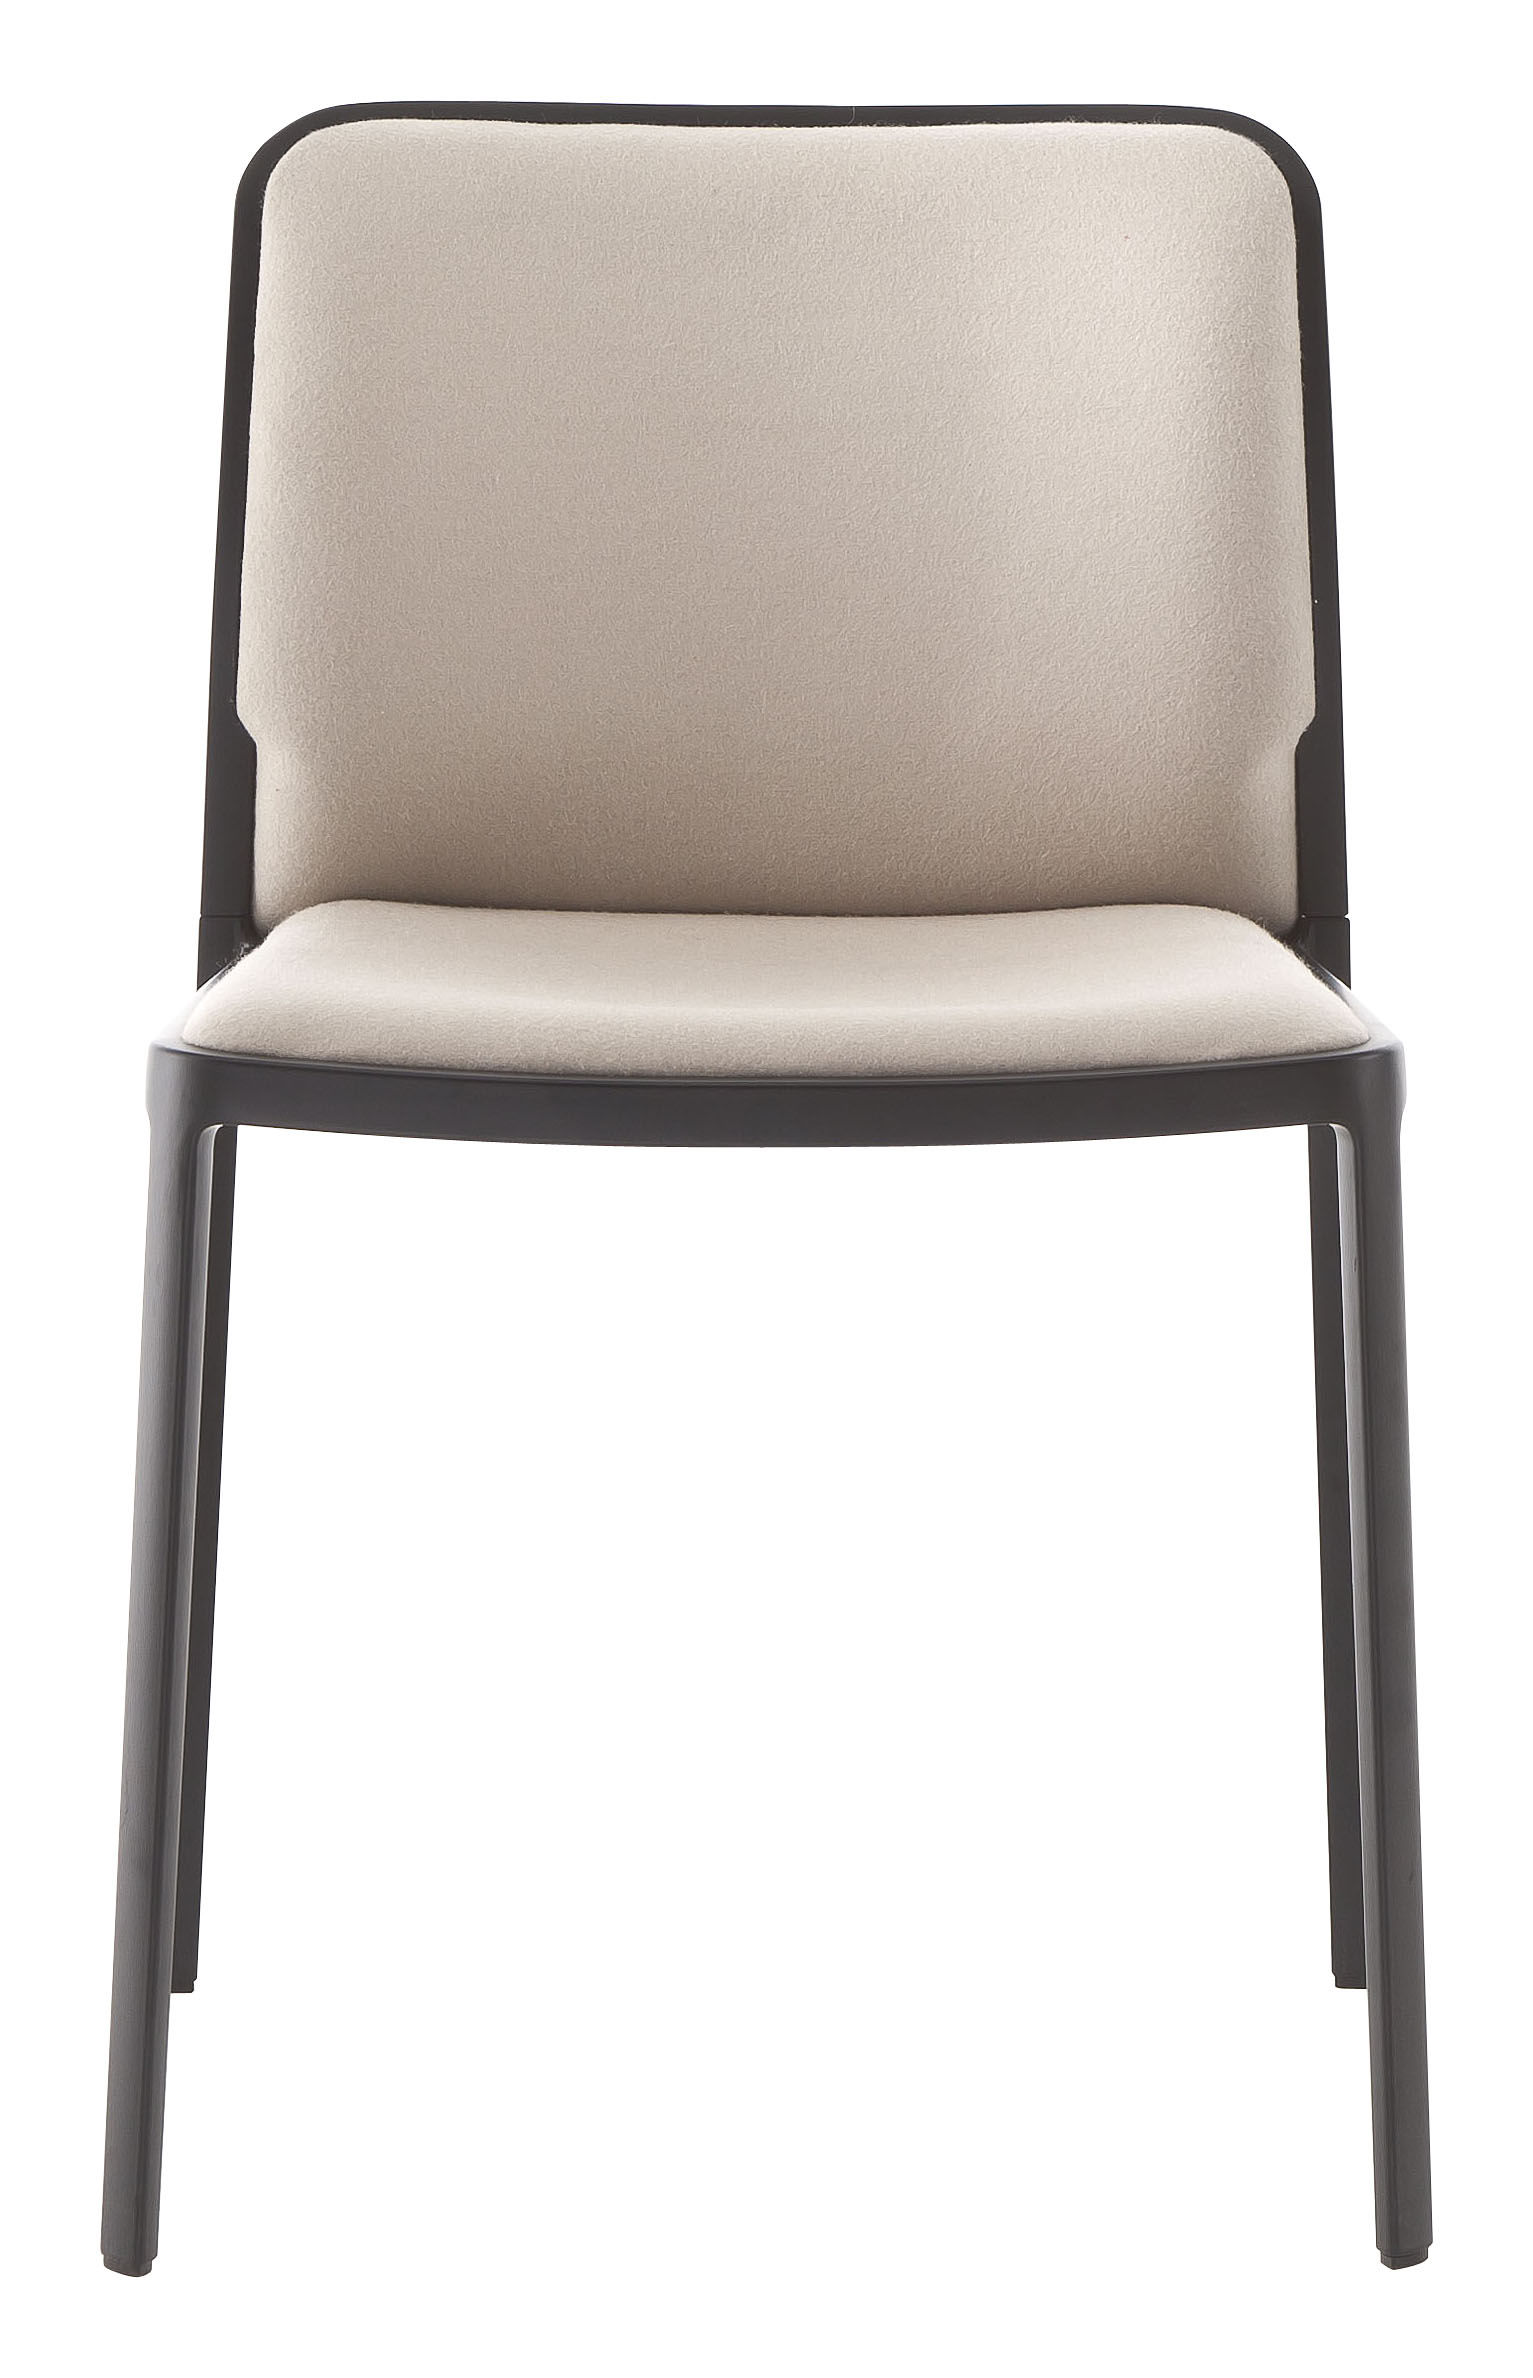 Möbel - Stühle  - Audrey Soft Gepolsterter Stuhl / Sitzfläche aus Stoff - Gestell lackiert - Kartell - Gestell: schwarz / Sitzfläche: Stoff beige - Gewebe, lackiertes Aluminium